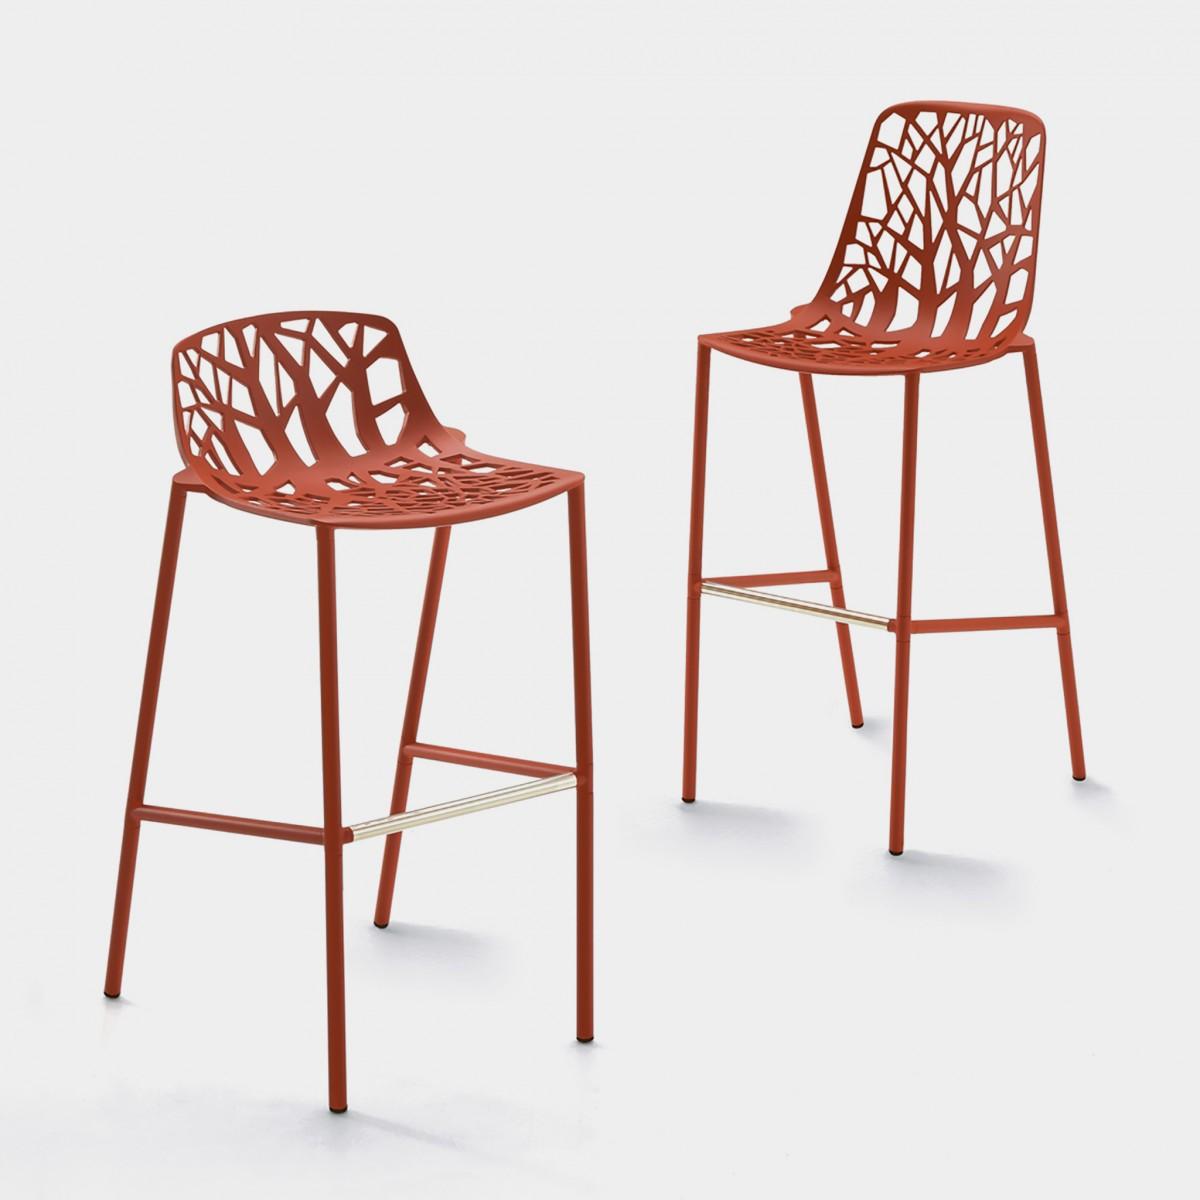 Designwebstore forest barhocker grau metallic niedrig for Barhocker taupe